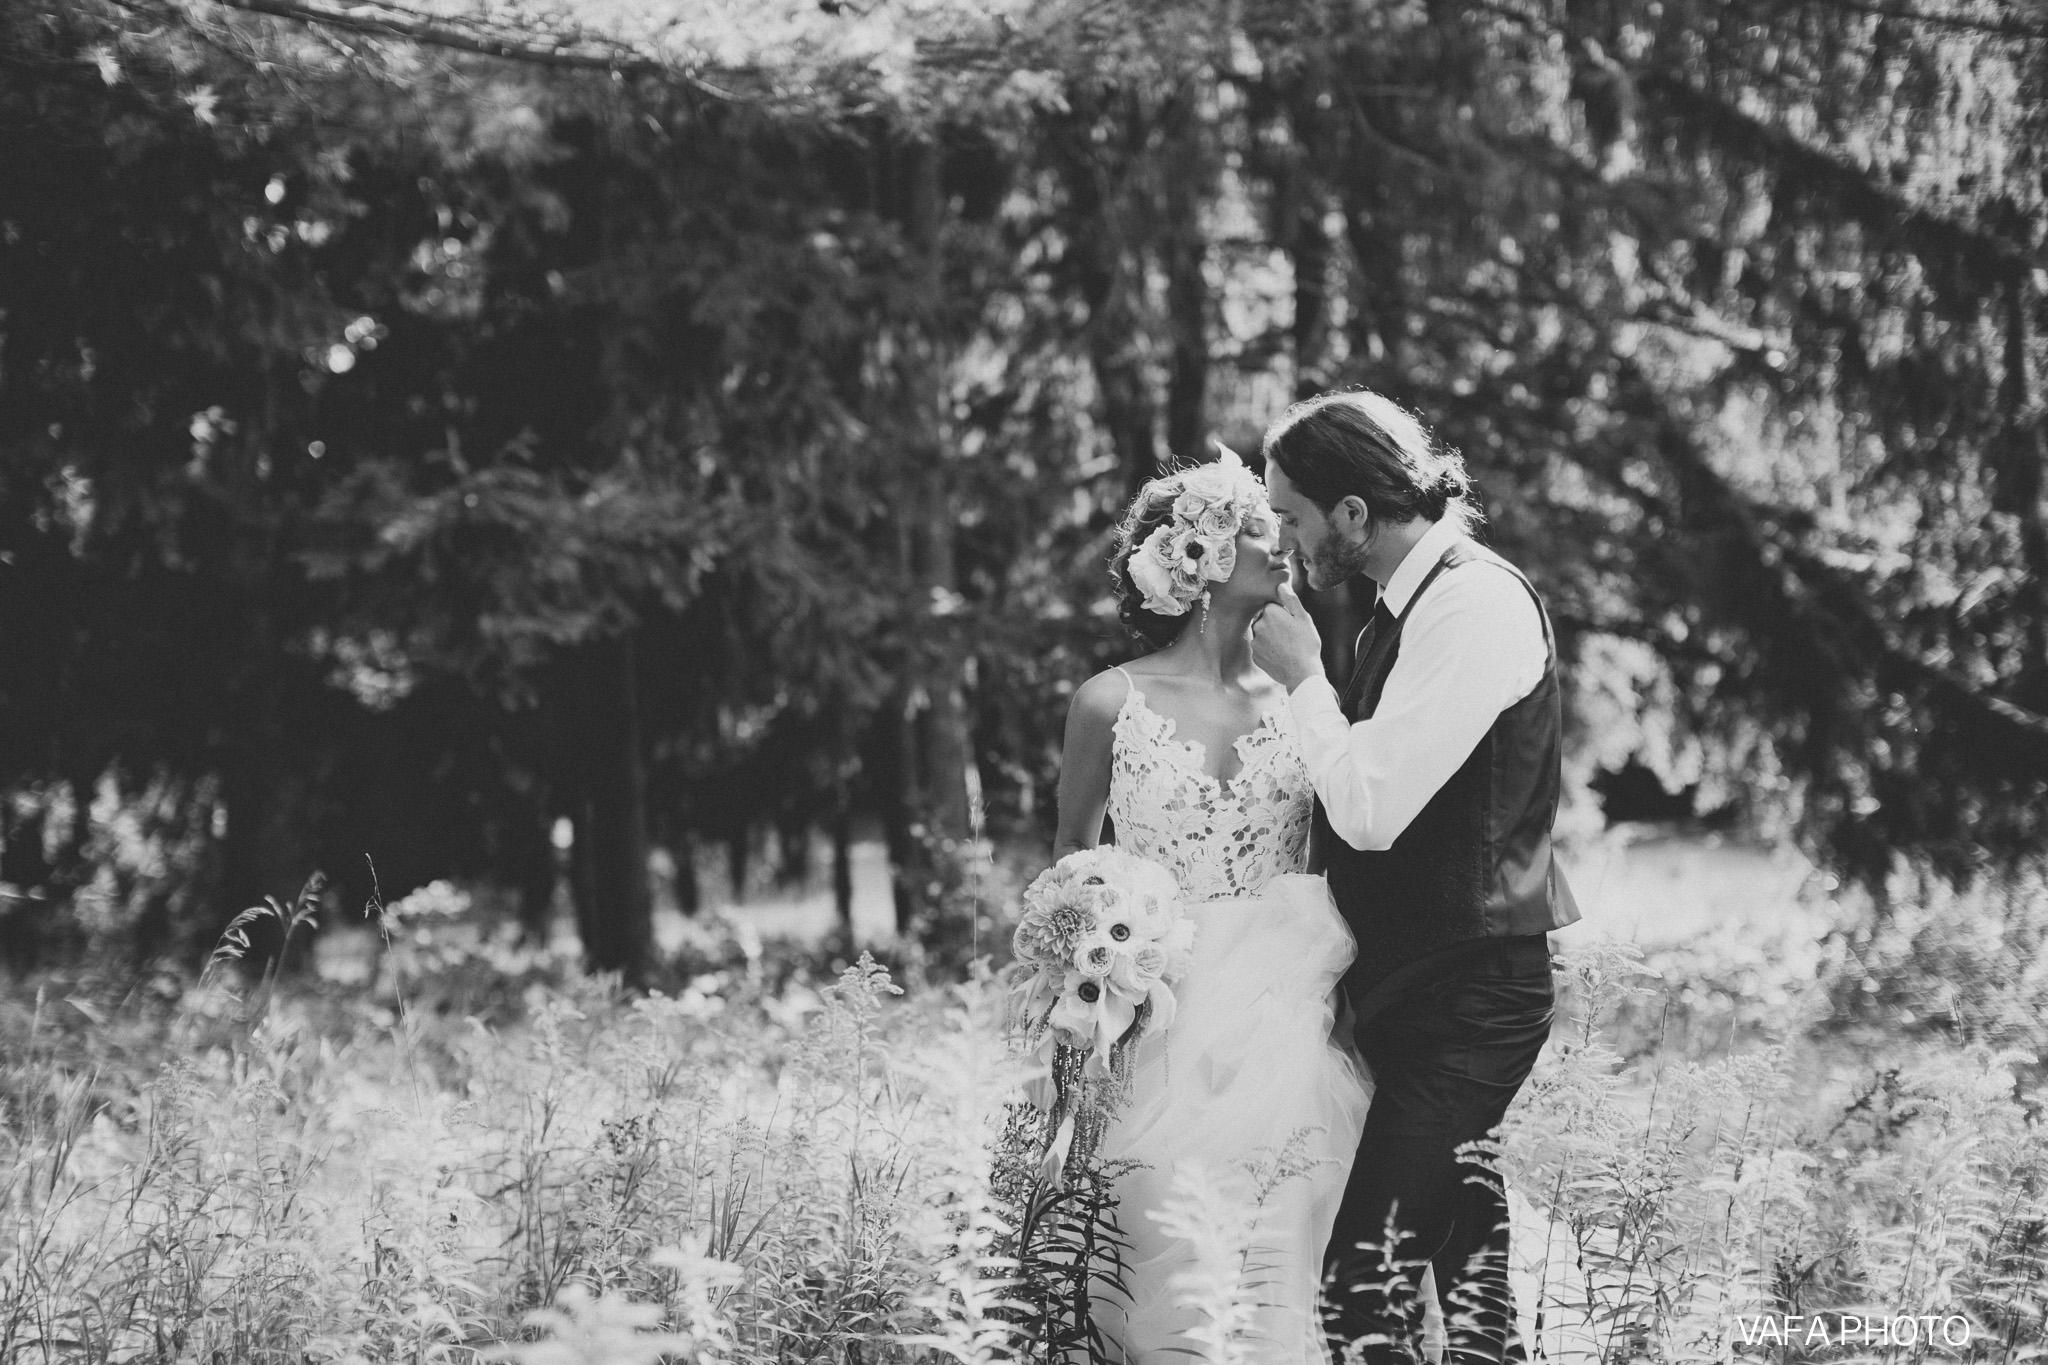 The-Felt-Estate-Wedding-Kailie-David-Vafa-Photo-780.jpg